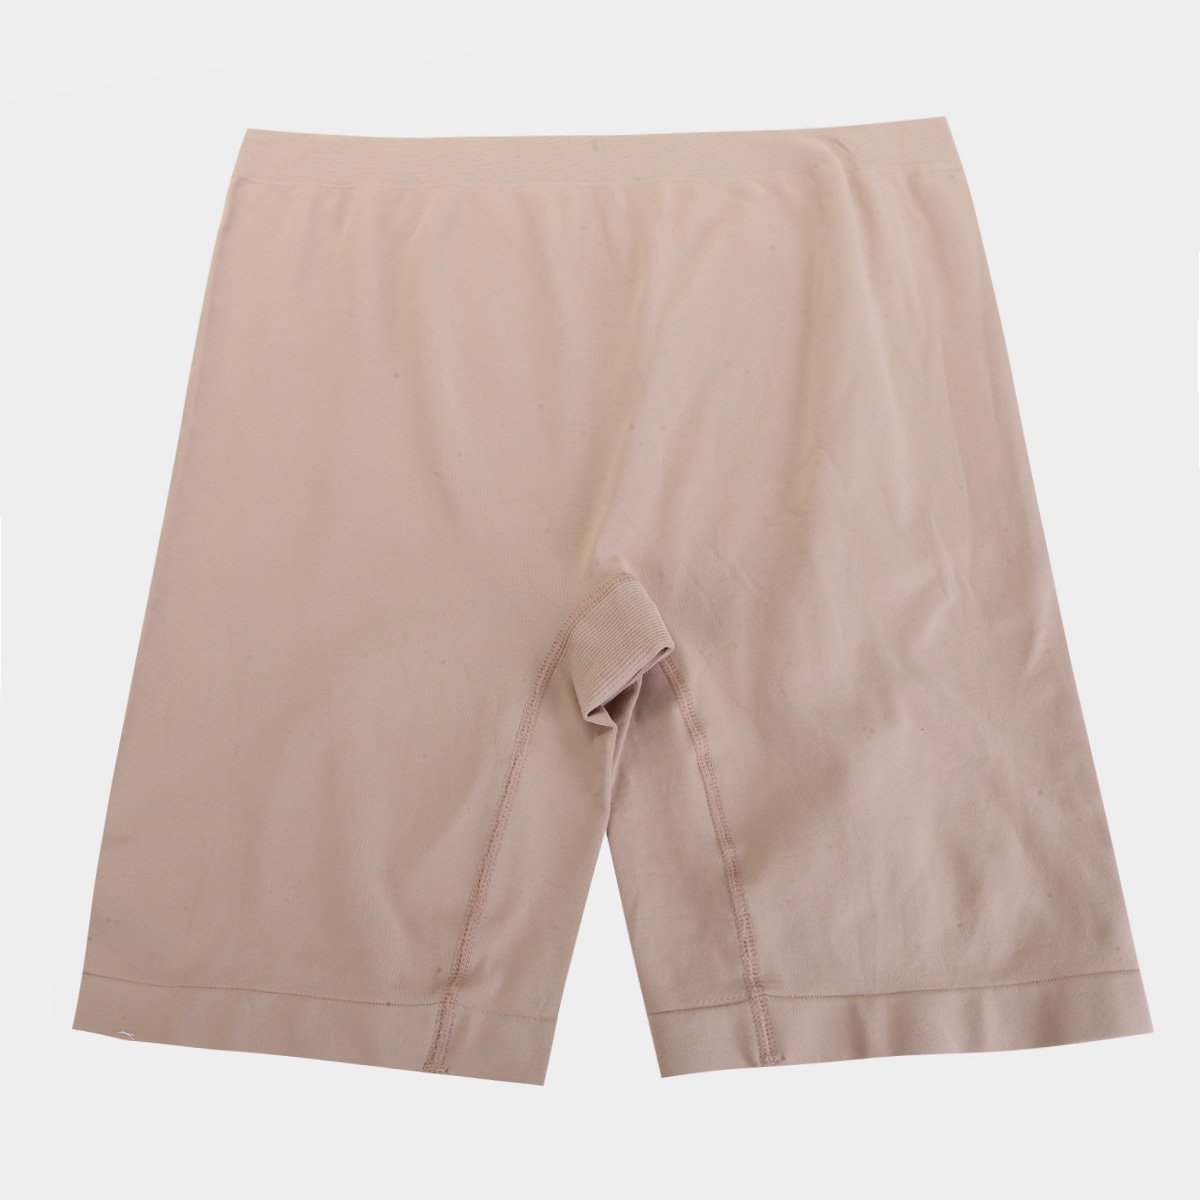 Shorts Modelador Lupo Sem Costura Plus Size